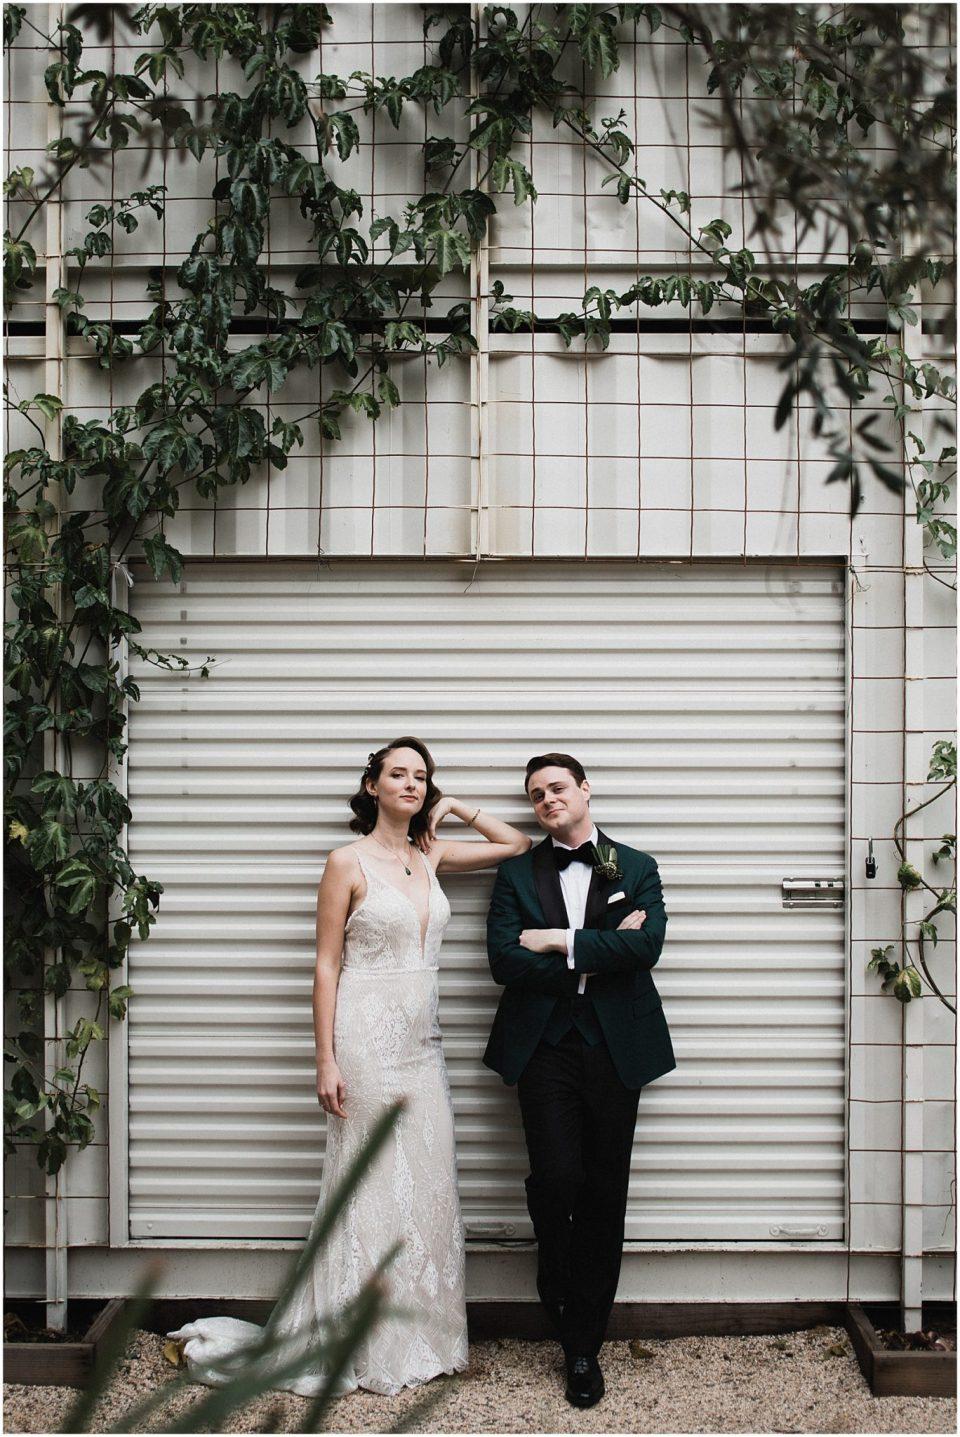 jessthony-wedding-sullivan-and-sullivan (162 of 496)_seattle wedding.jpg